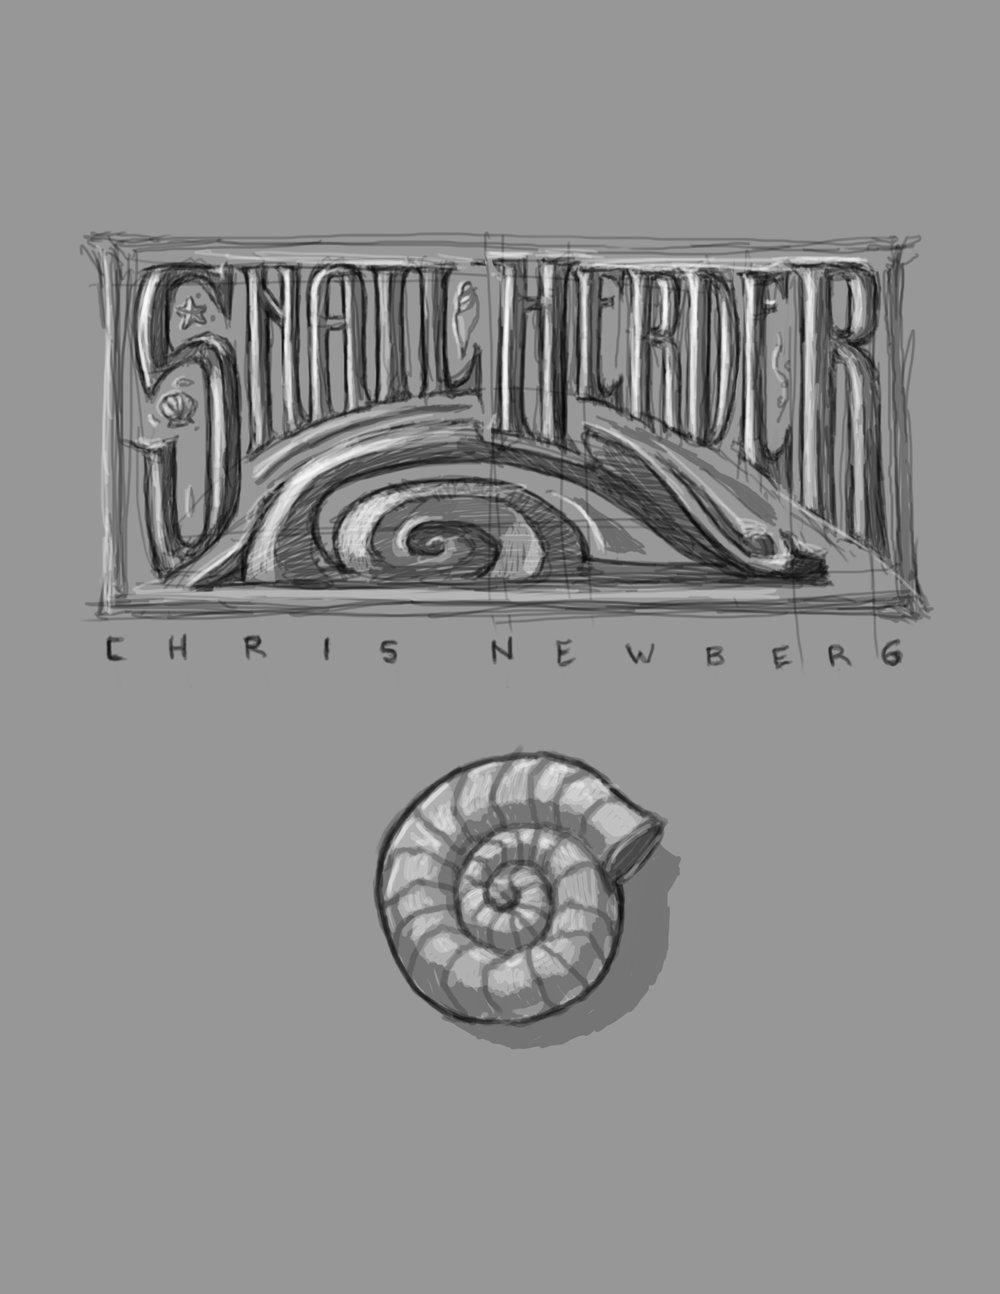 SNAILHERDER title page.jpg